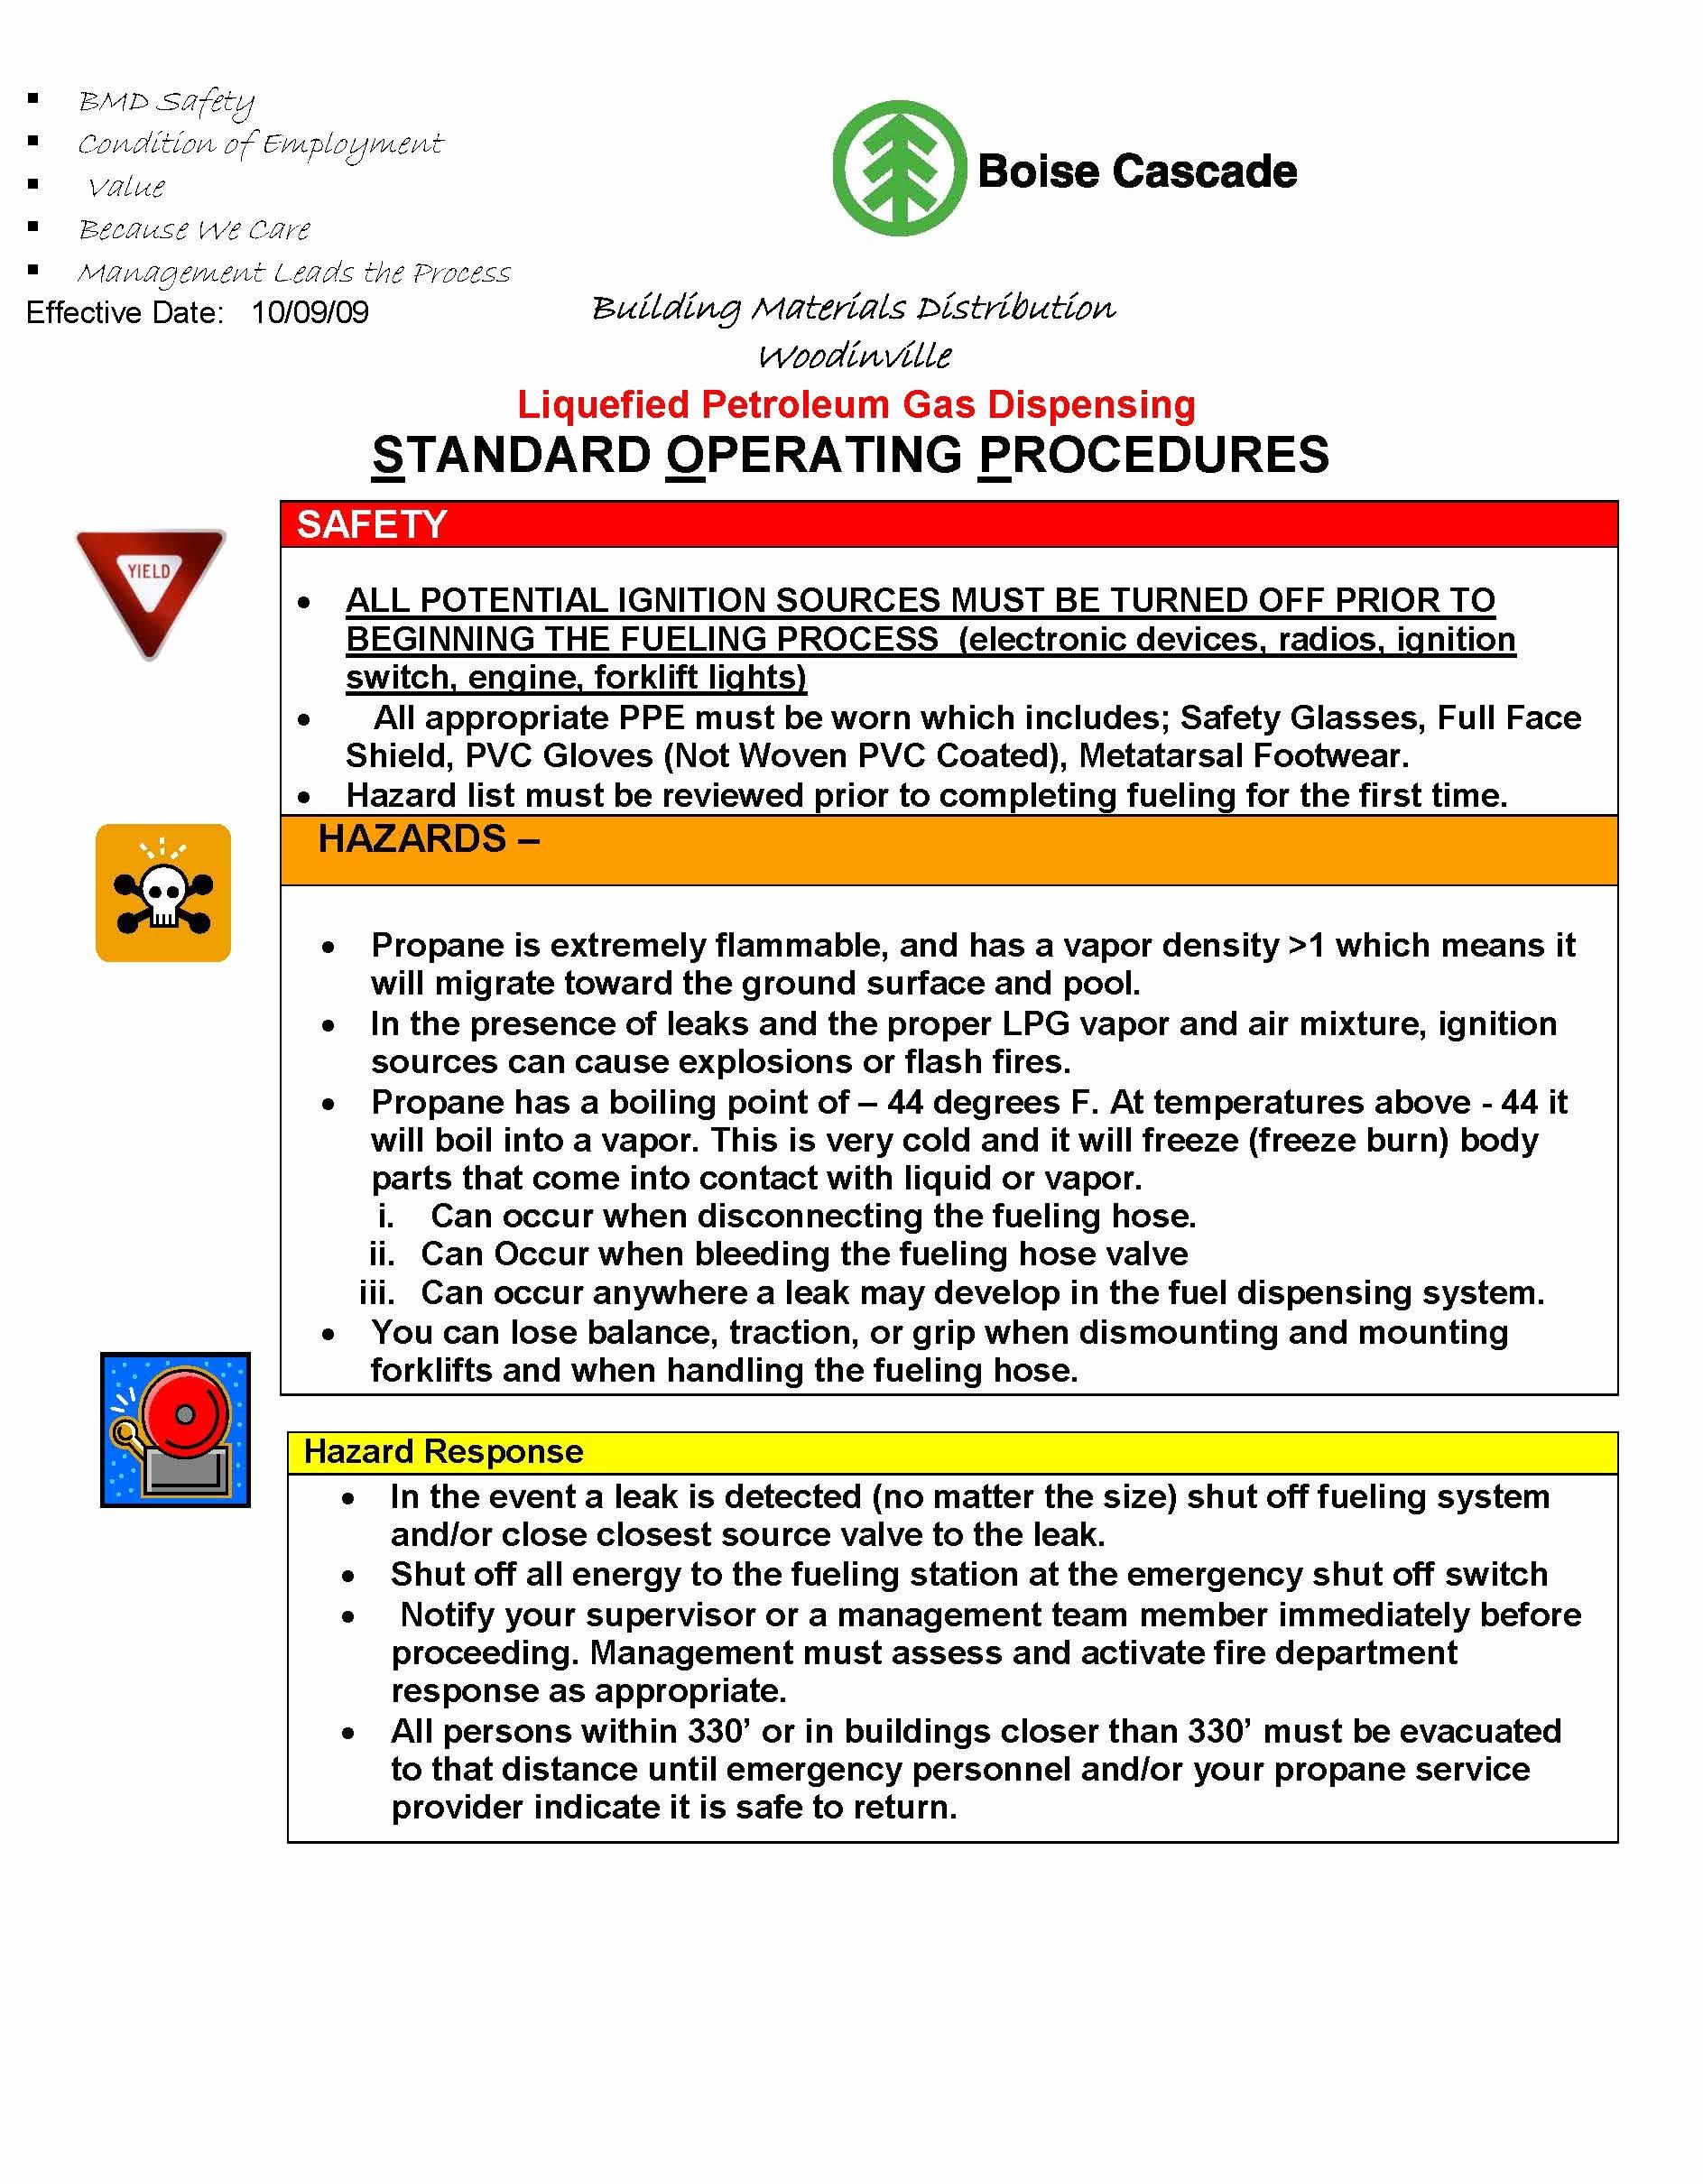 Warehouse Standard Operating Procedures Template Fresh Download sop Template Free Warehouse Avenue